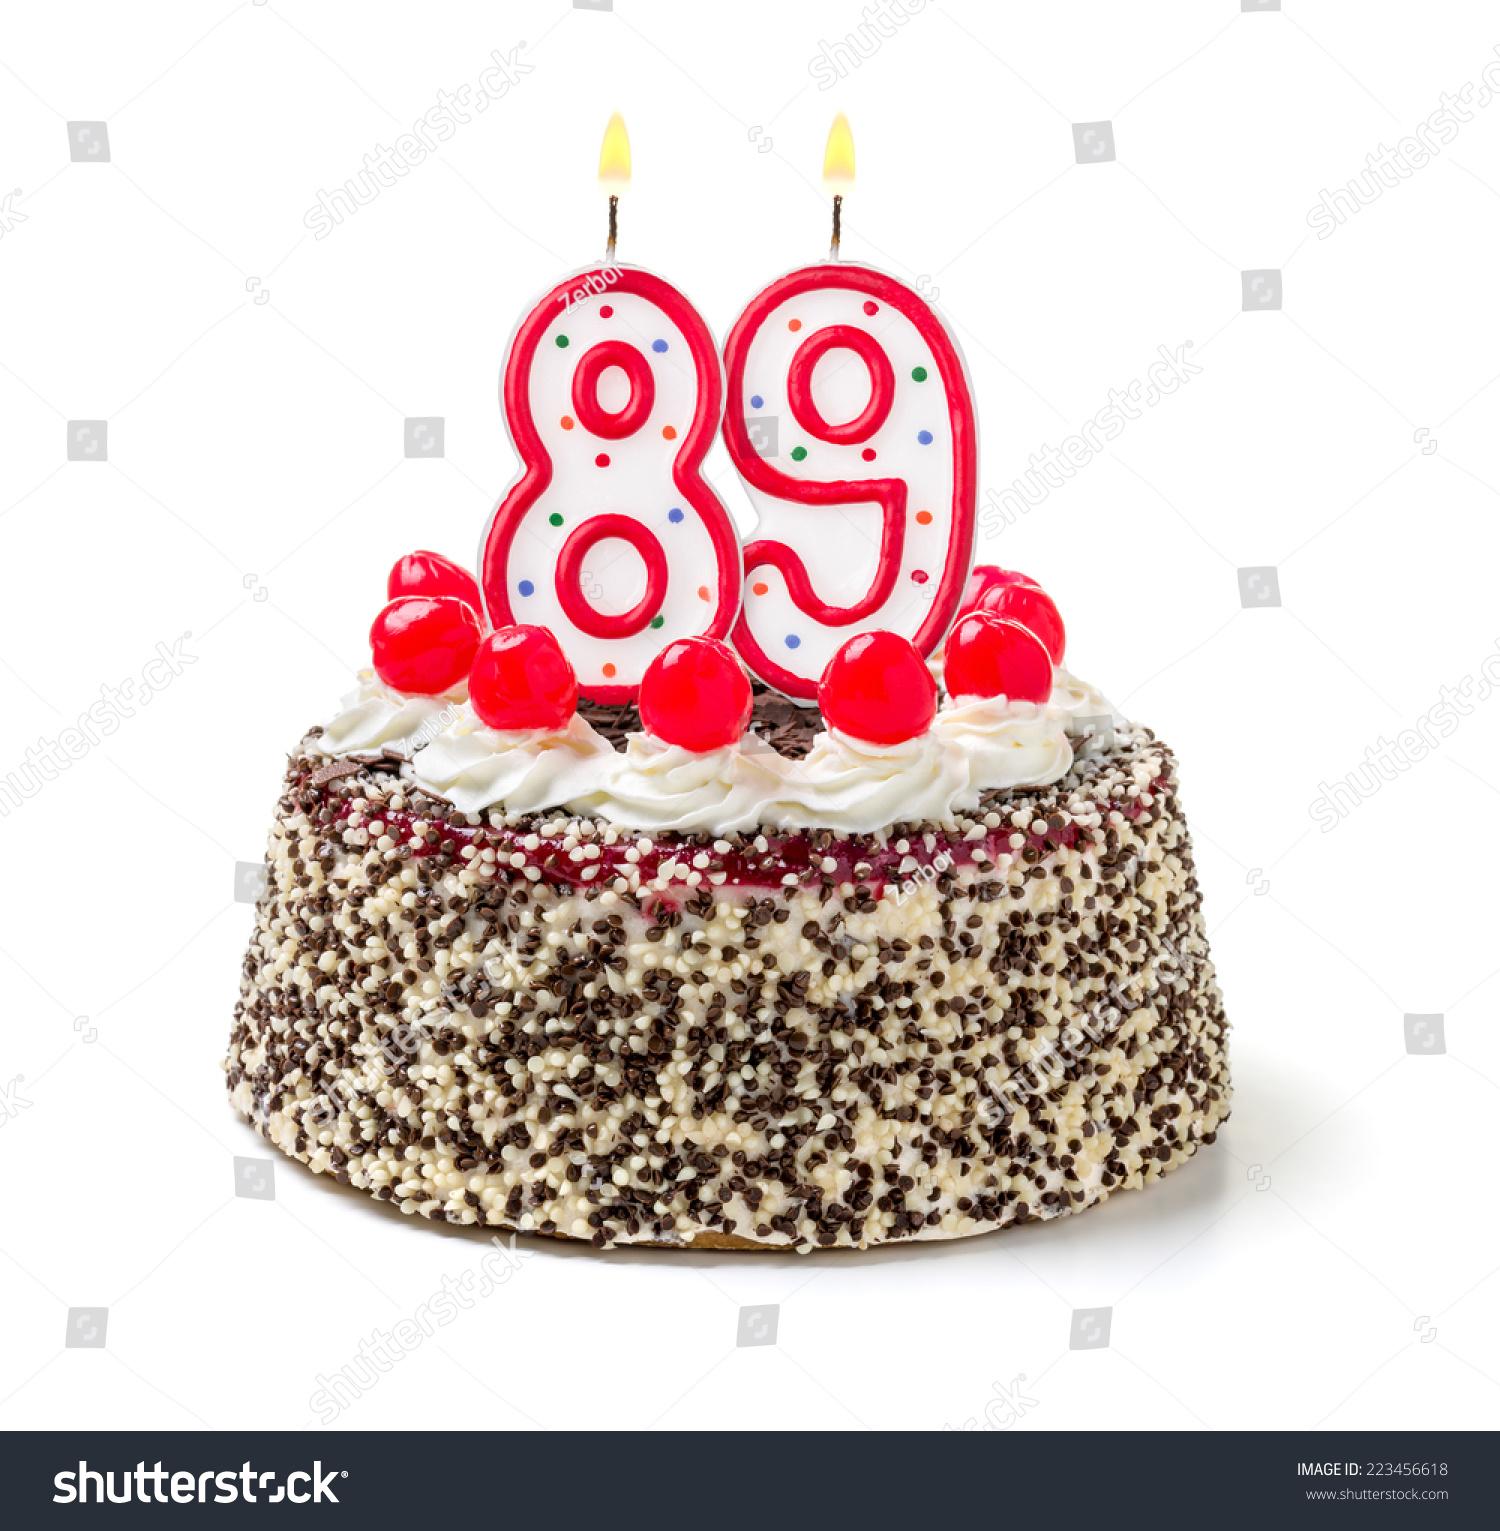 Birthday Cake Burning Candle Number 89 Stock Photo Edit Now